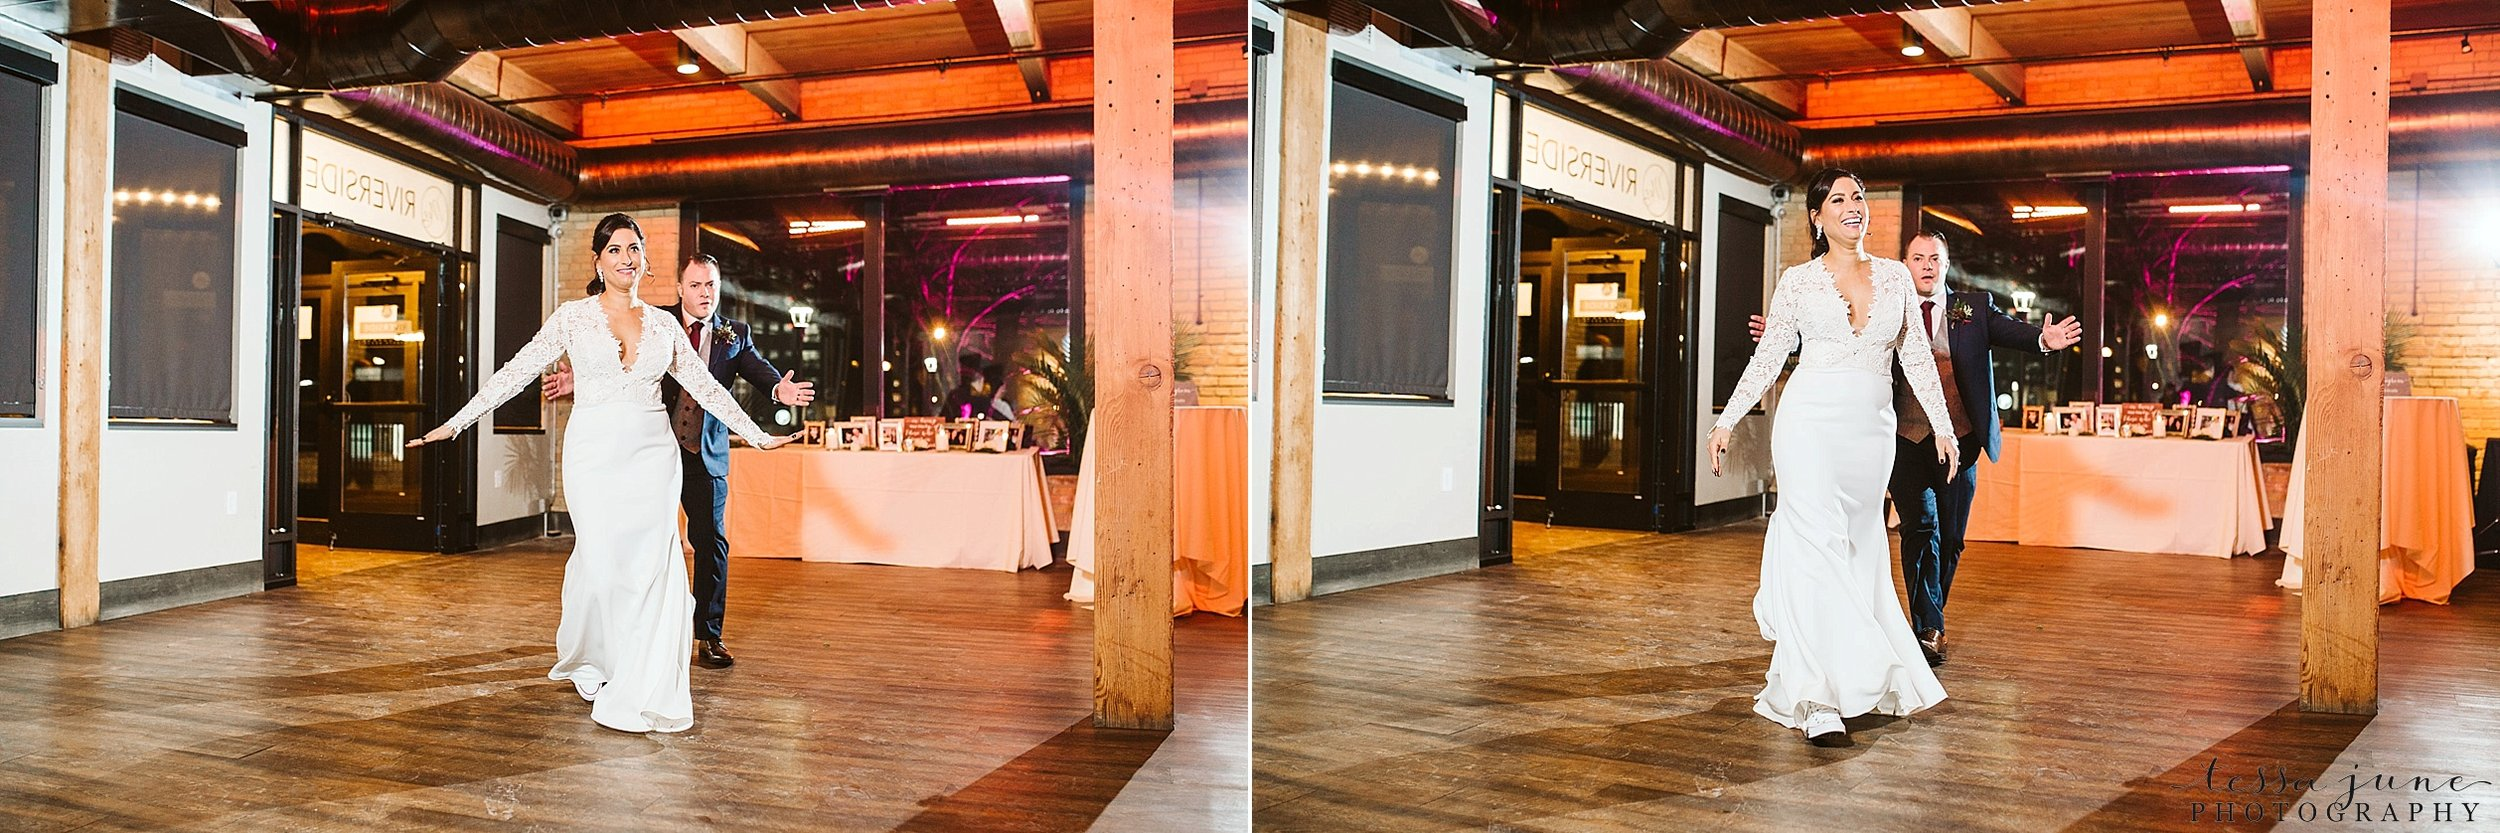 minneapolis-event-center-winter-romantic-snow-wedding-december-176.jpg